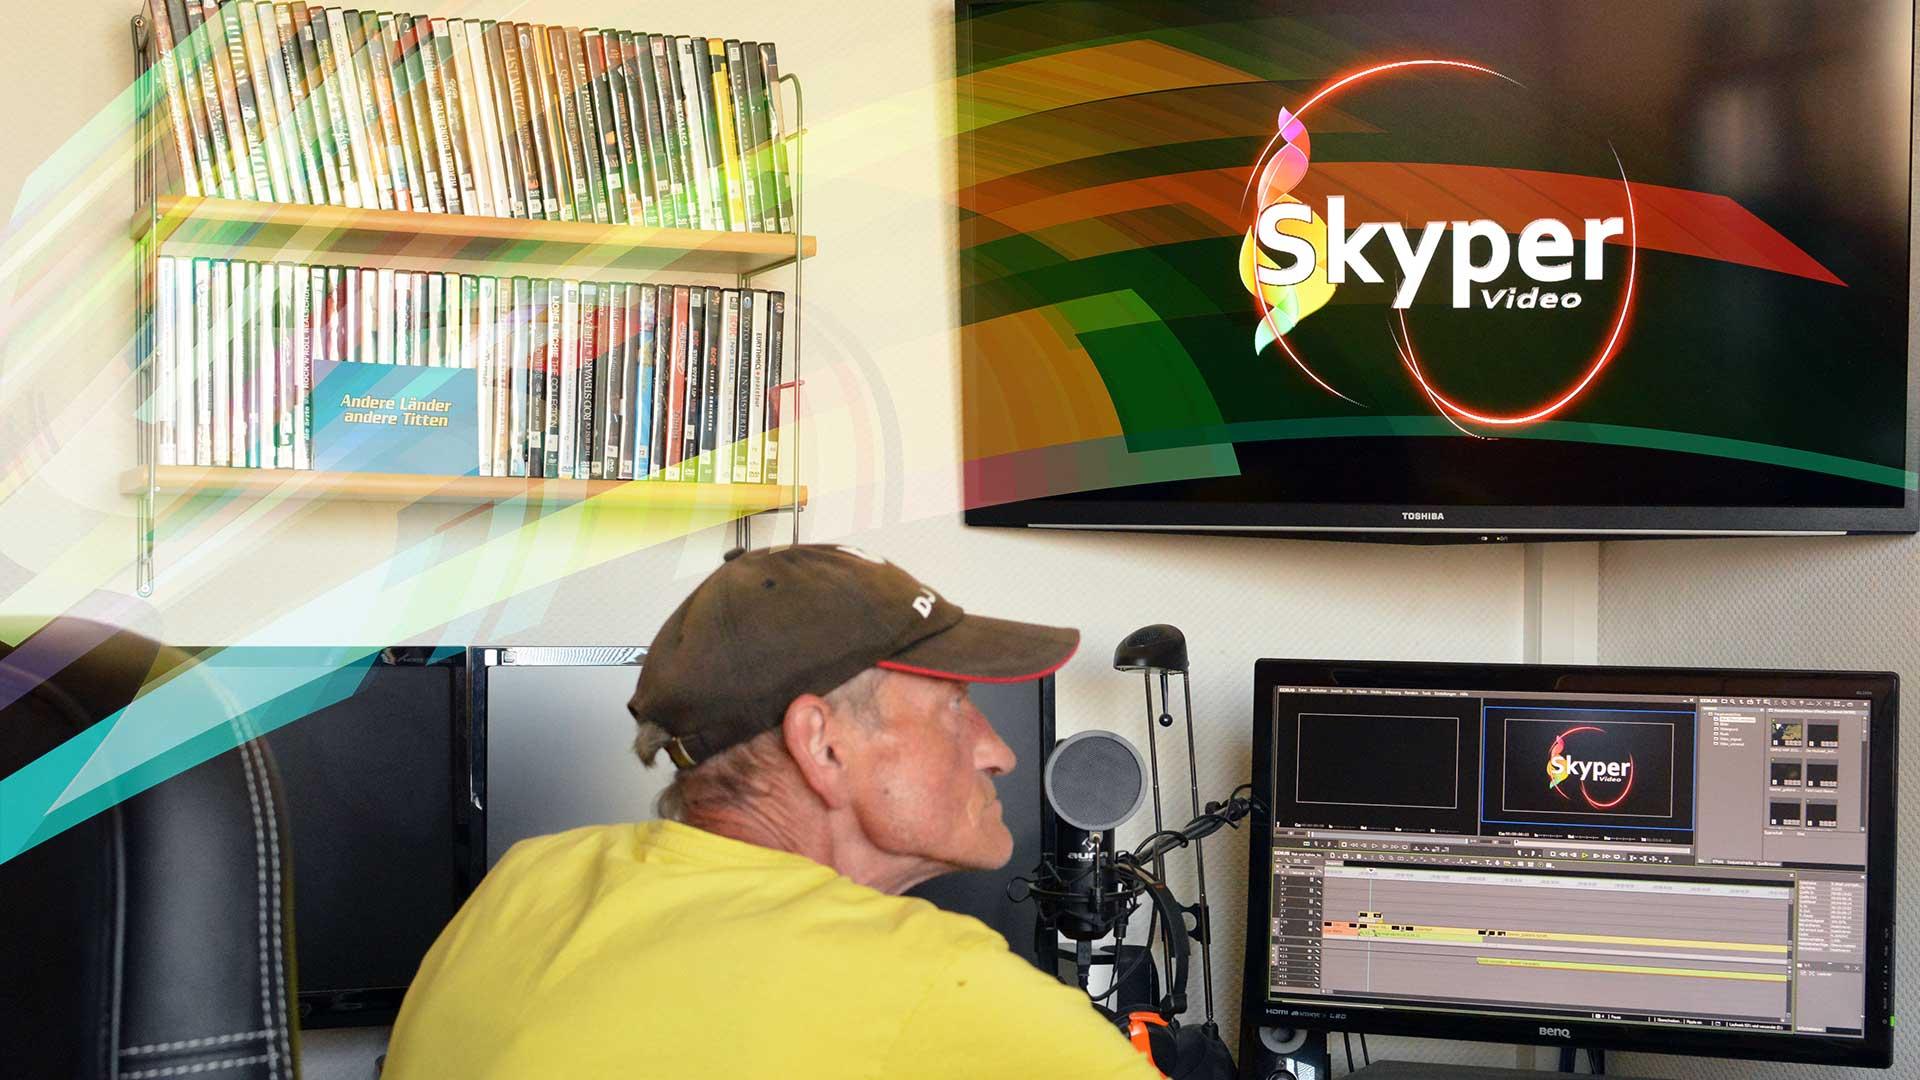 Skyper Video Filmbearbeitung im Büro